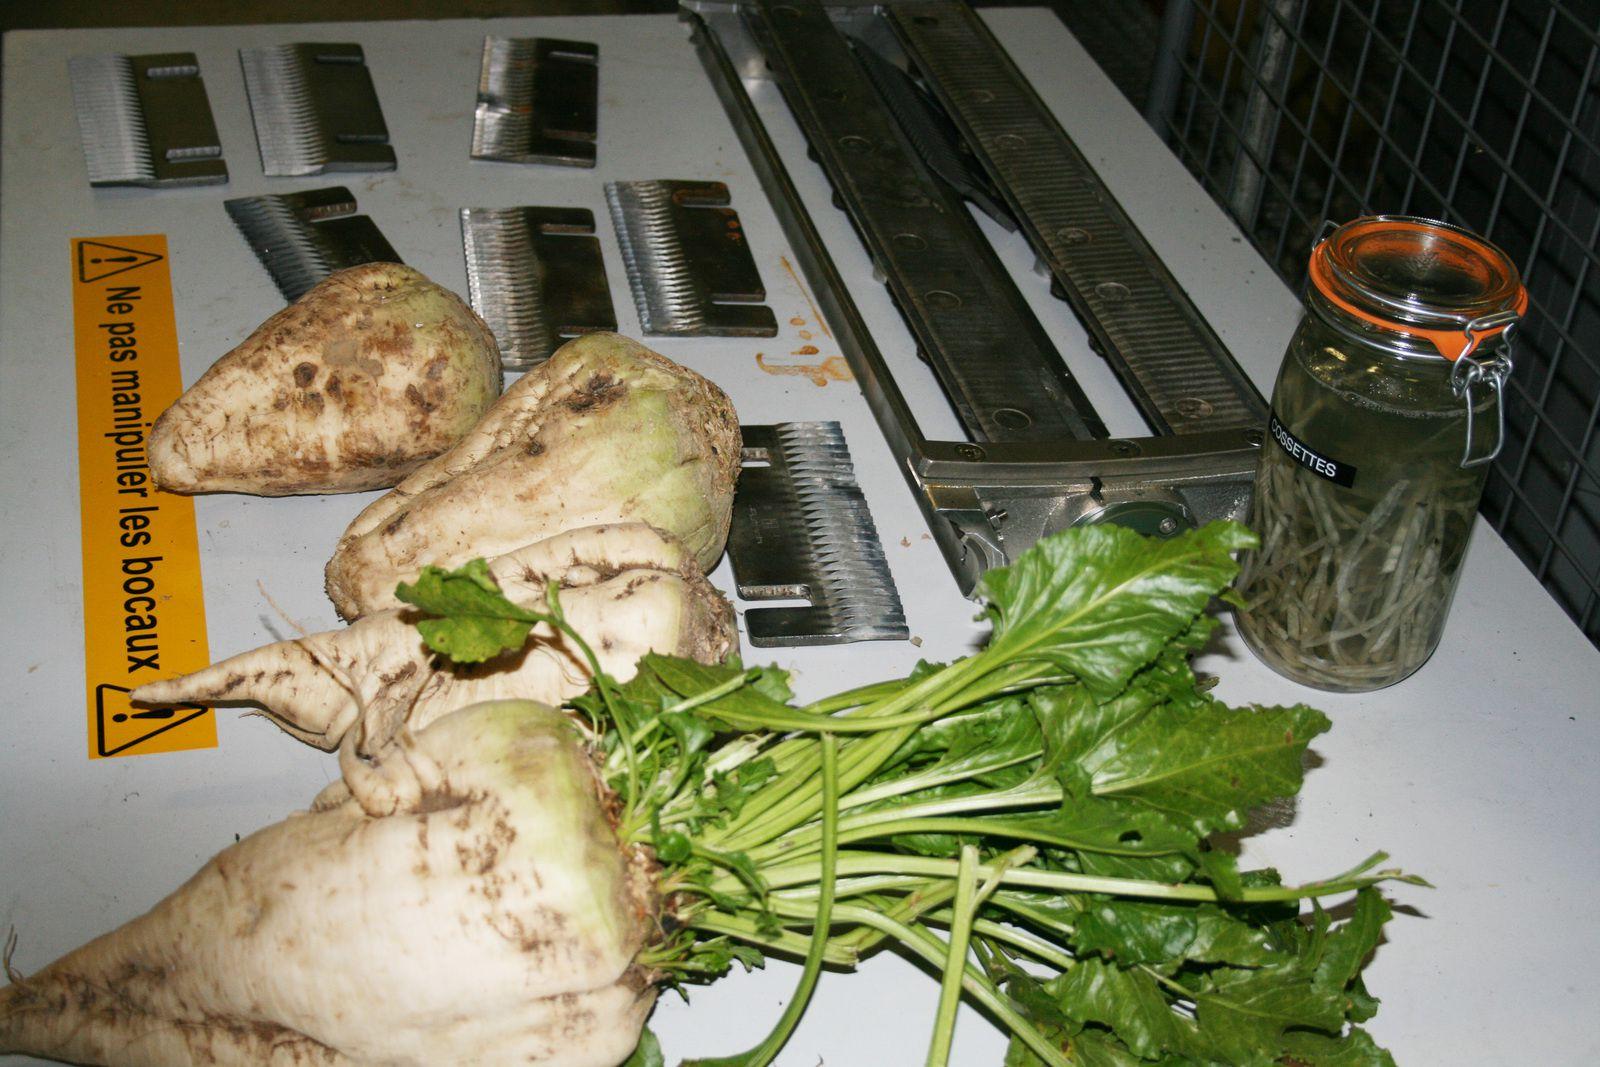 Visite de la sucrerie d'Origny Sainte-Benoite